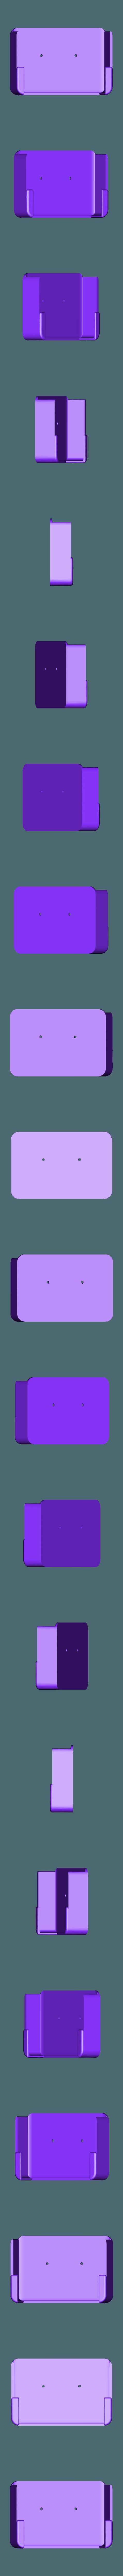 Switch_bracket (1).stl Download free STL file Wall mount bracket for Netgear fs605 switch & others • 3D printing object, MeesterEduard